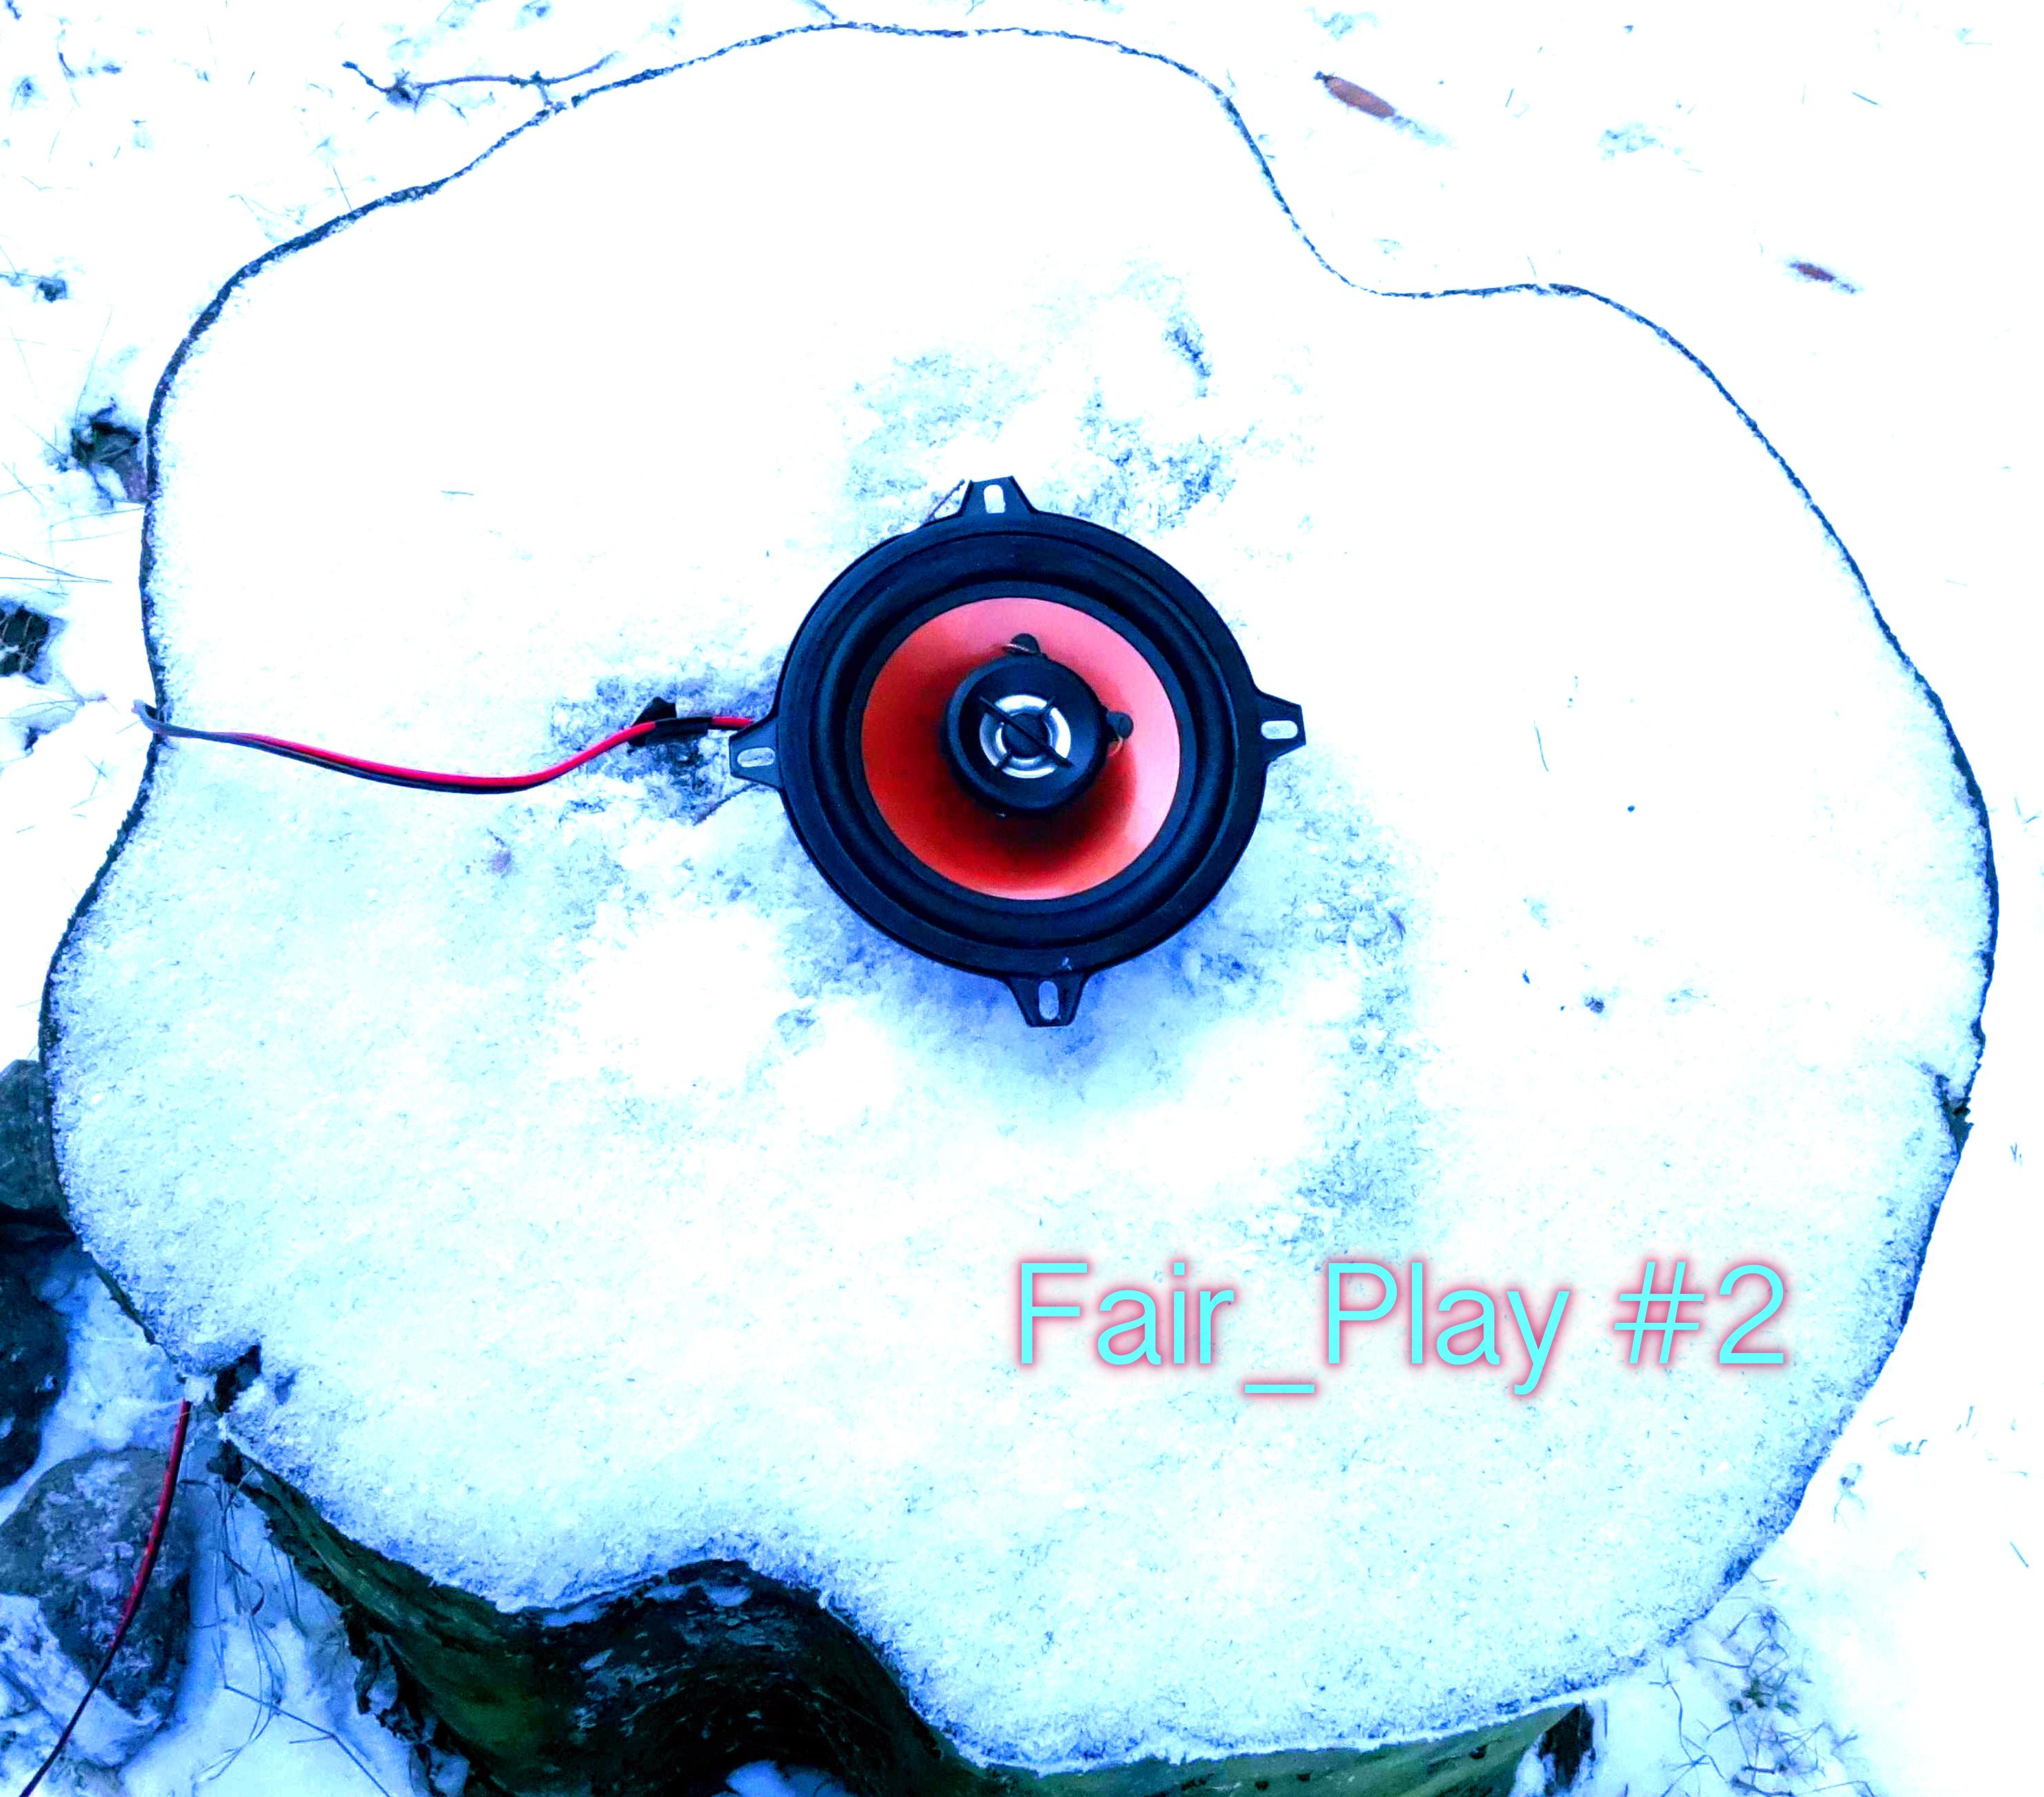 Fair_Play One